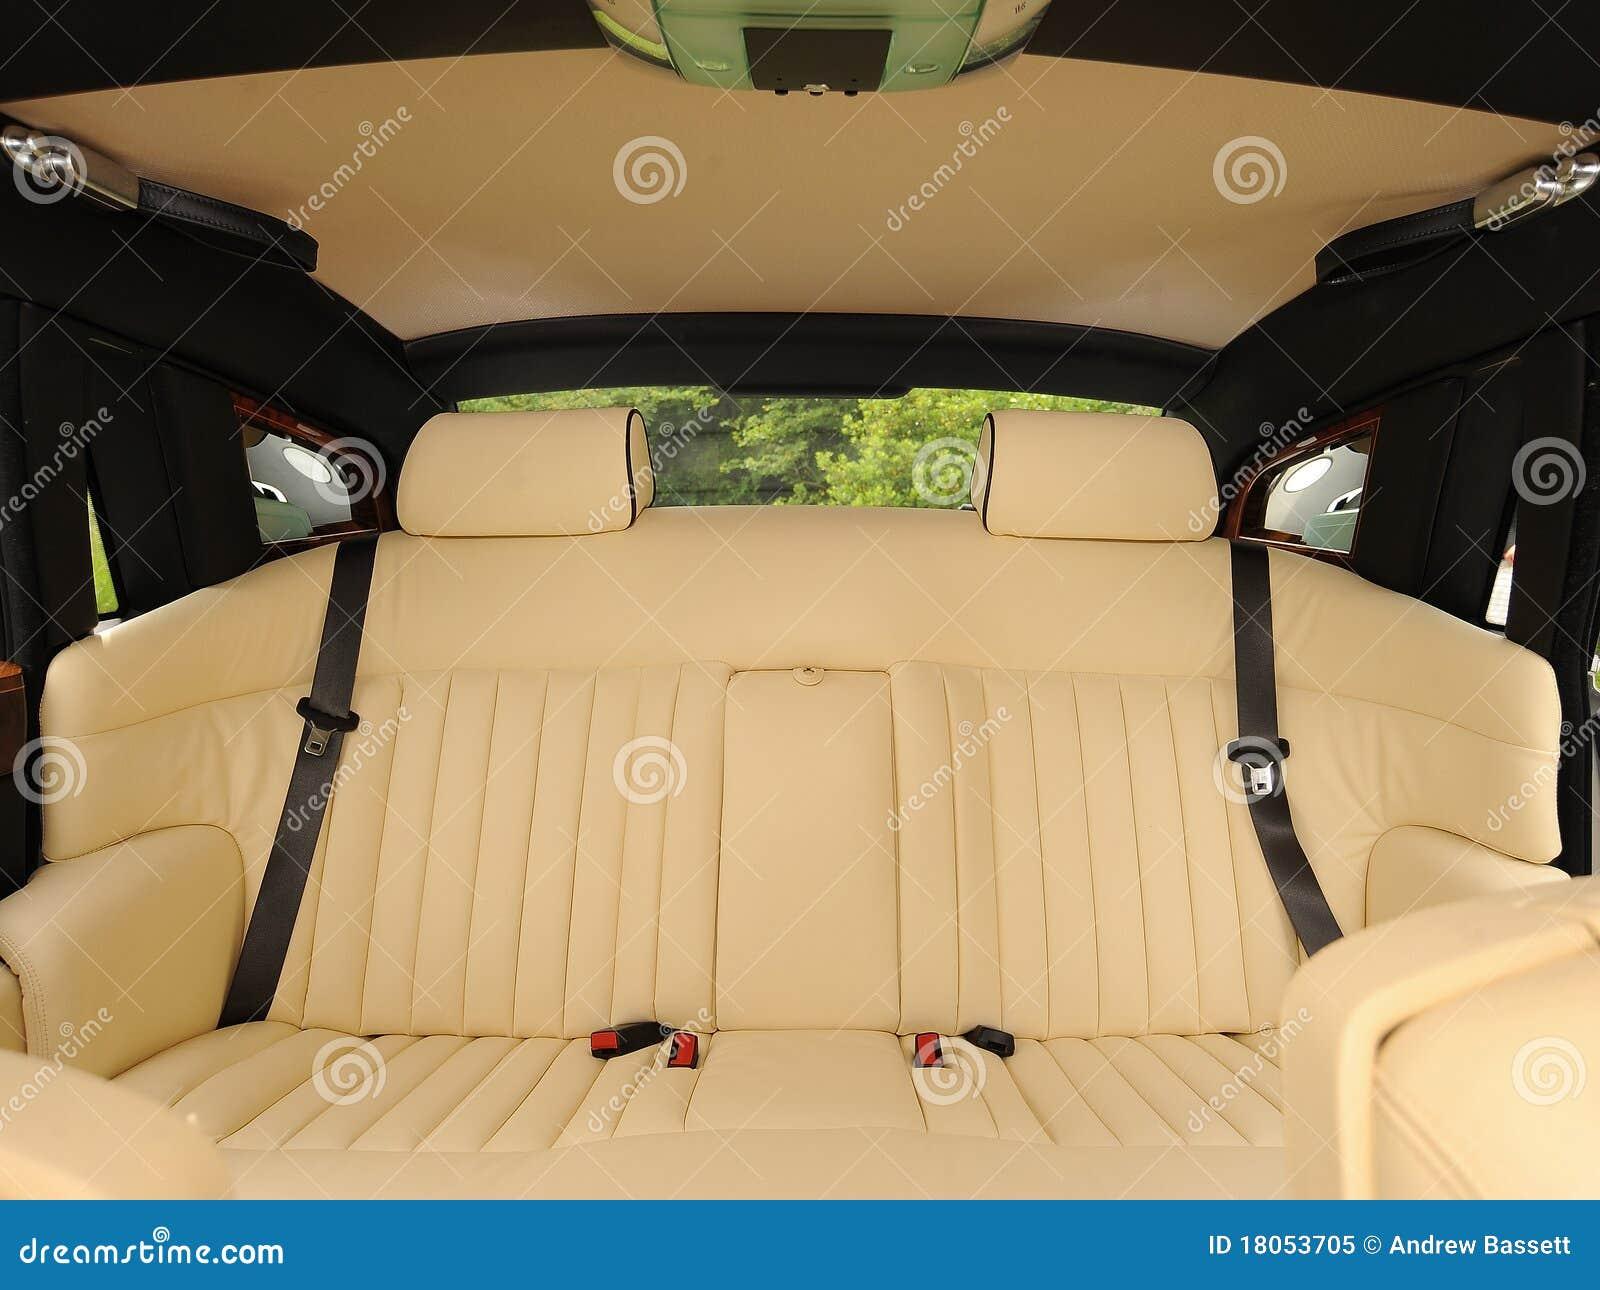 luxury interior of car stock image image of auto comfortable 18053705. Black Bedroom Furniture Sets. Home Design Ideas